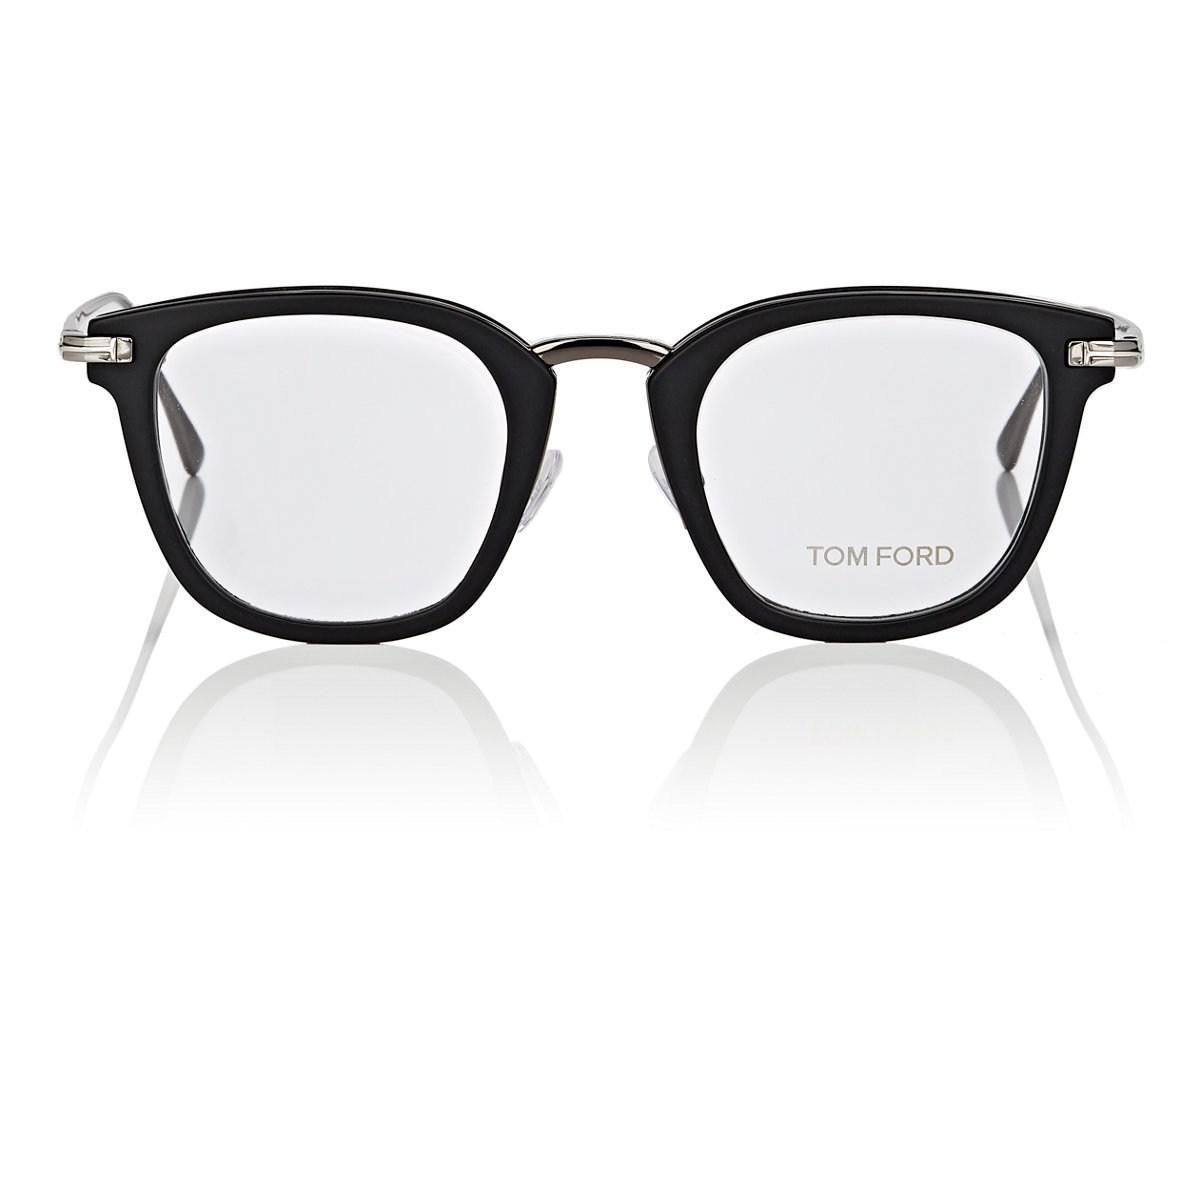 79fe882ac7a Tom Ford Tf5496 Eyeglasses for Men - Lyst